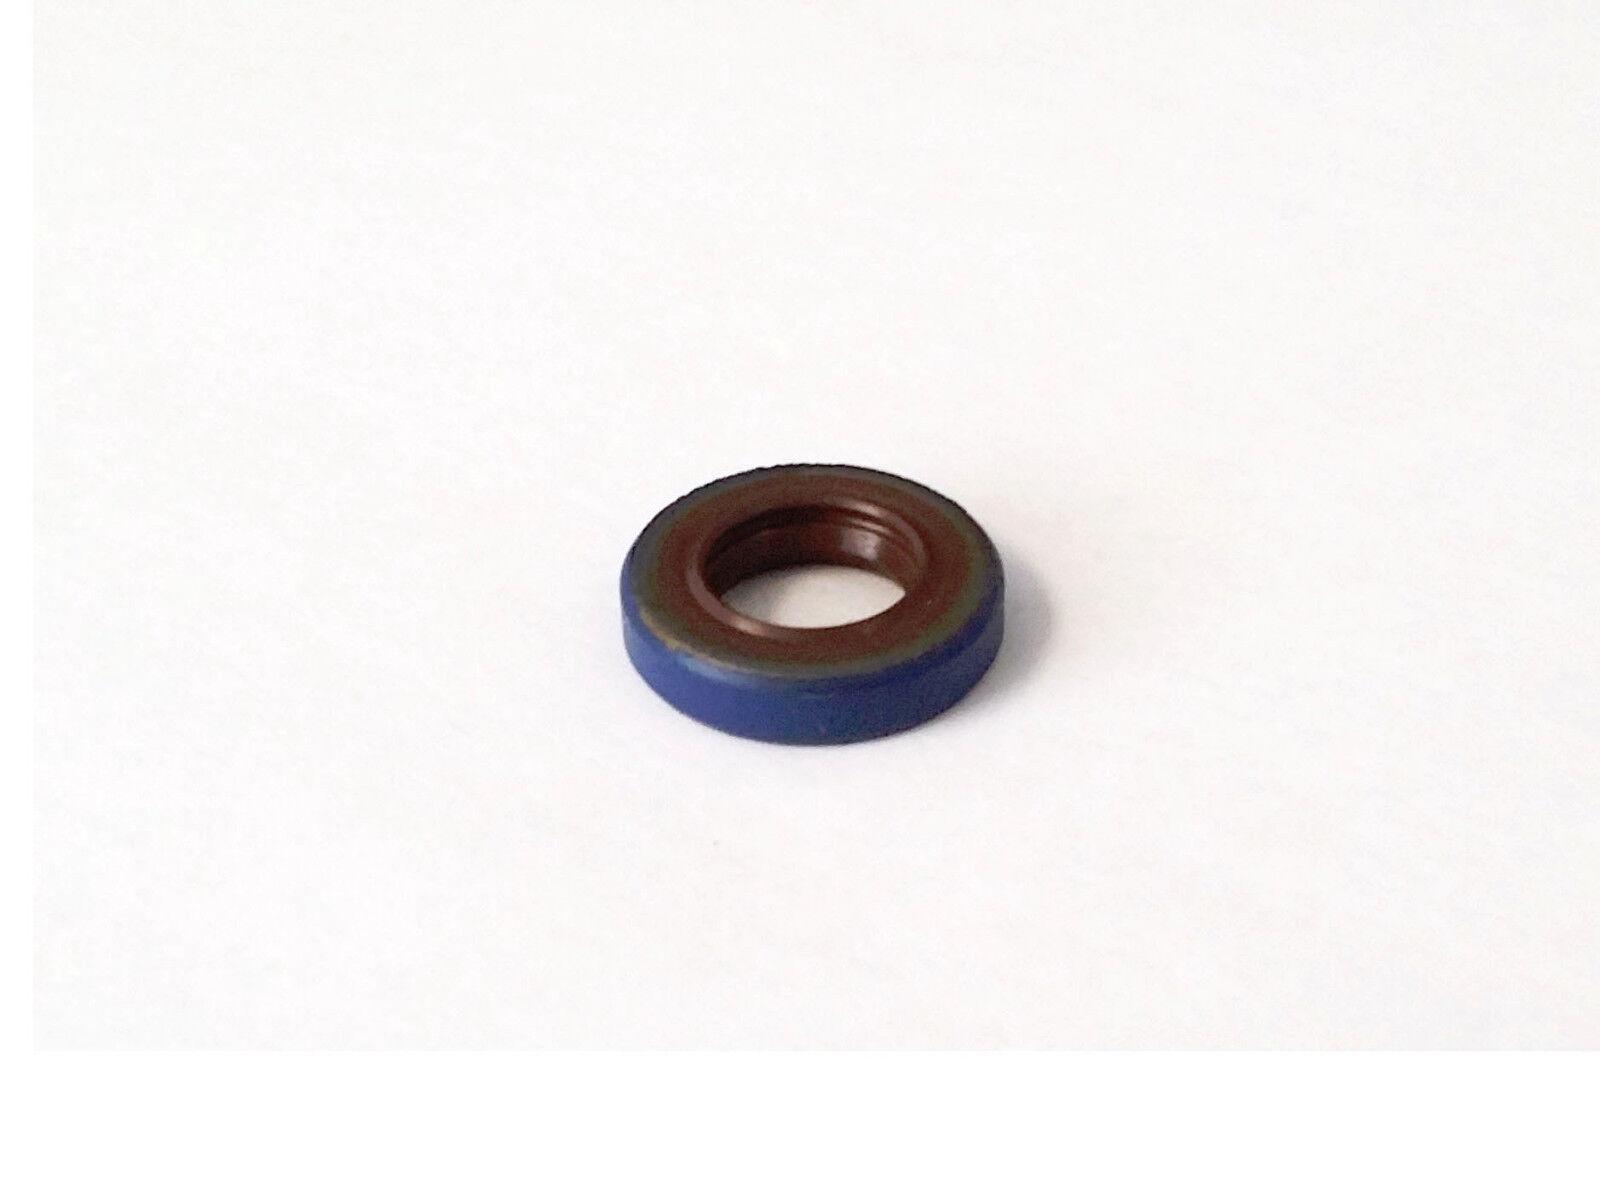 7//8 ID 1-1//16 OD 1-1//16 OD Pack of 1000 Sur-Seal Fluoropolymer Elastomer 7//8 ID 70 Durometer Hardness Pack of 1000 Sterling Seal ORVT118x1000 Viton Number-118 Standard O-Ring